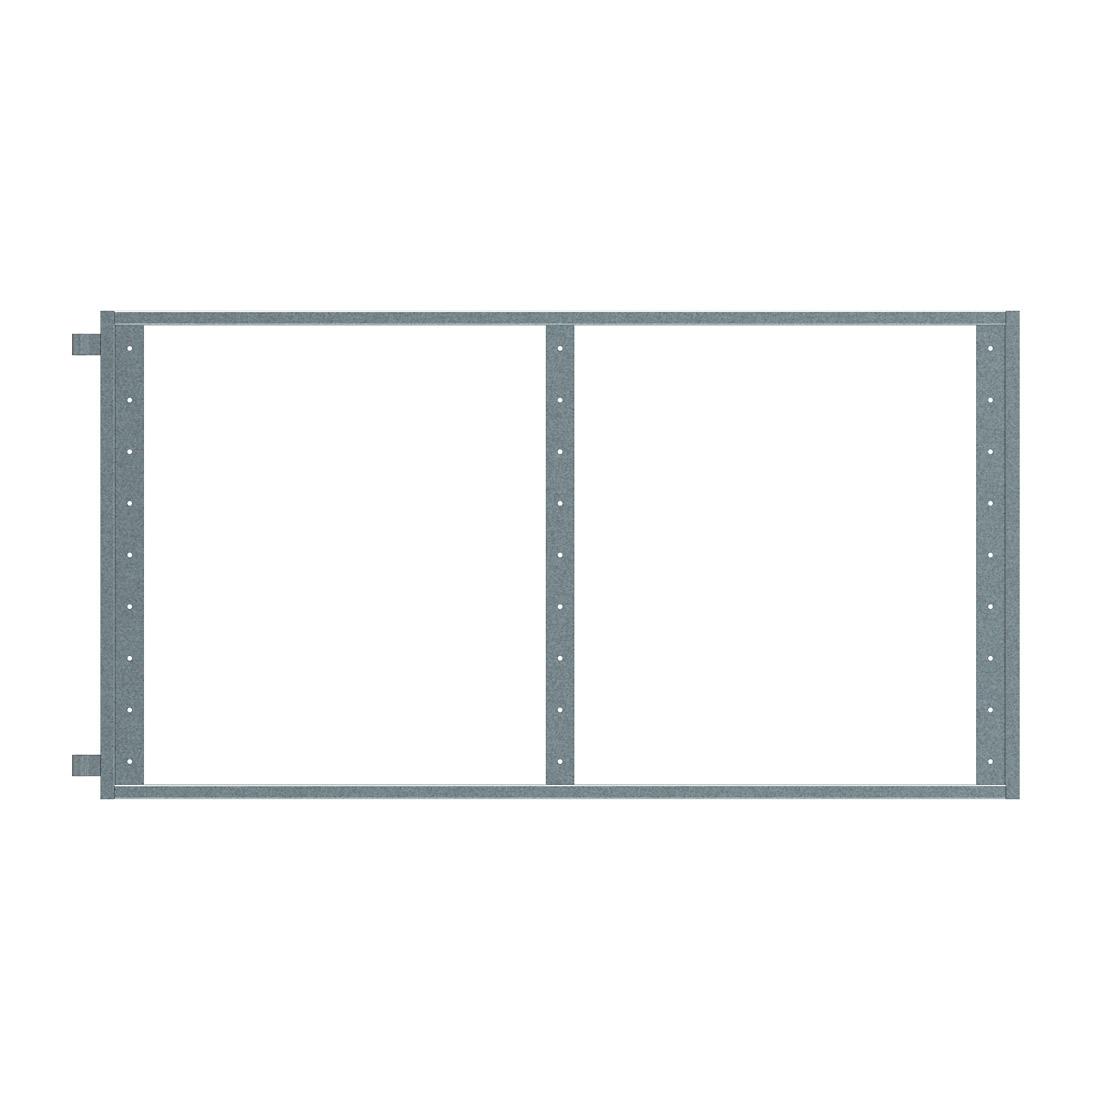 Sheepyard gate 1600mm x 850mm (frame only)